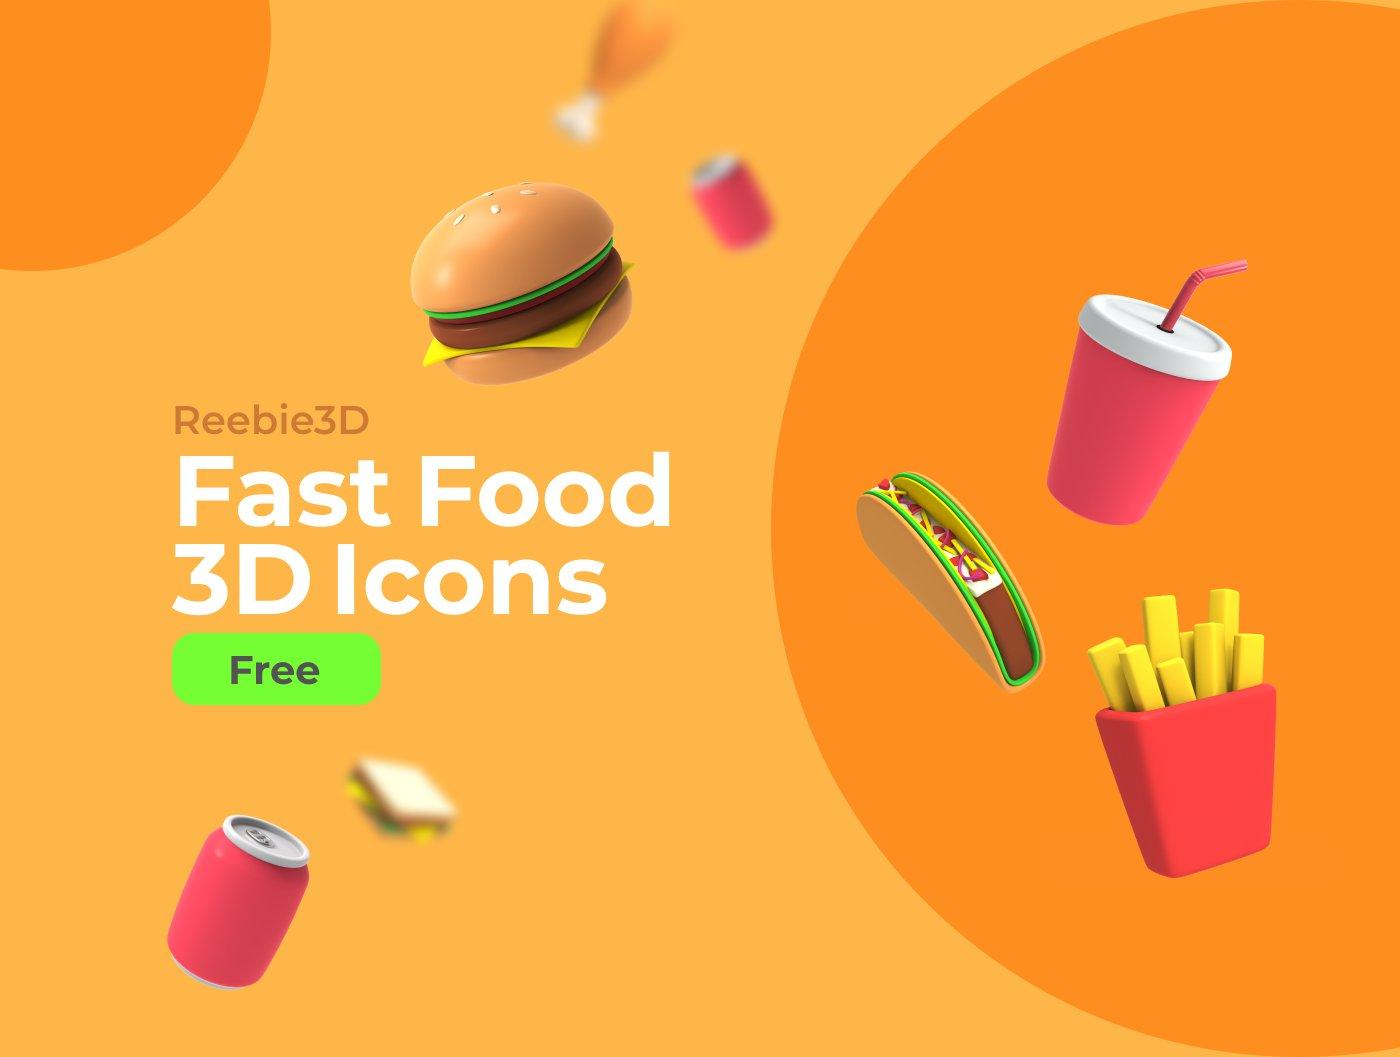 FREE Reebie3D Fast Food 3D Icons